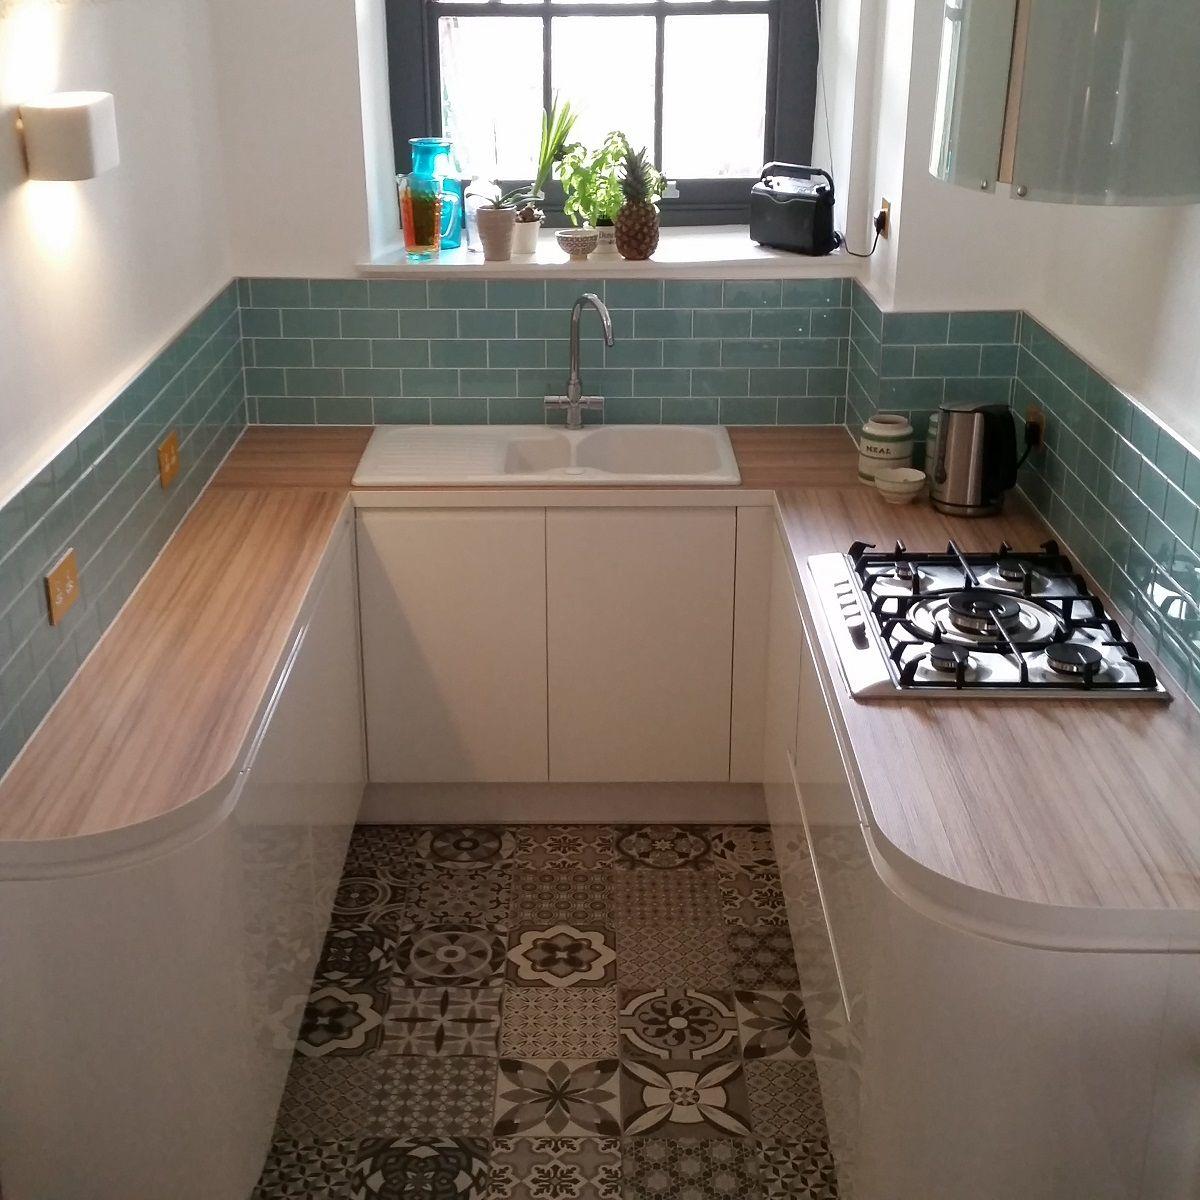 Glass Tile Ideas & Inspiration | Farmhouse kitchen remodel ...